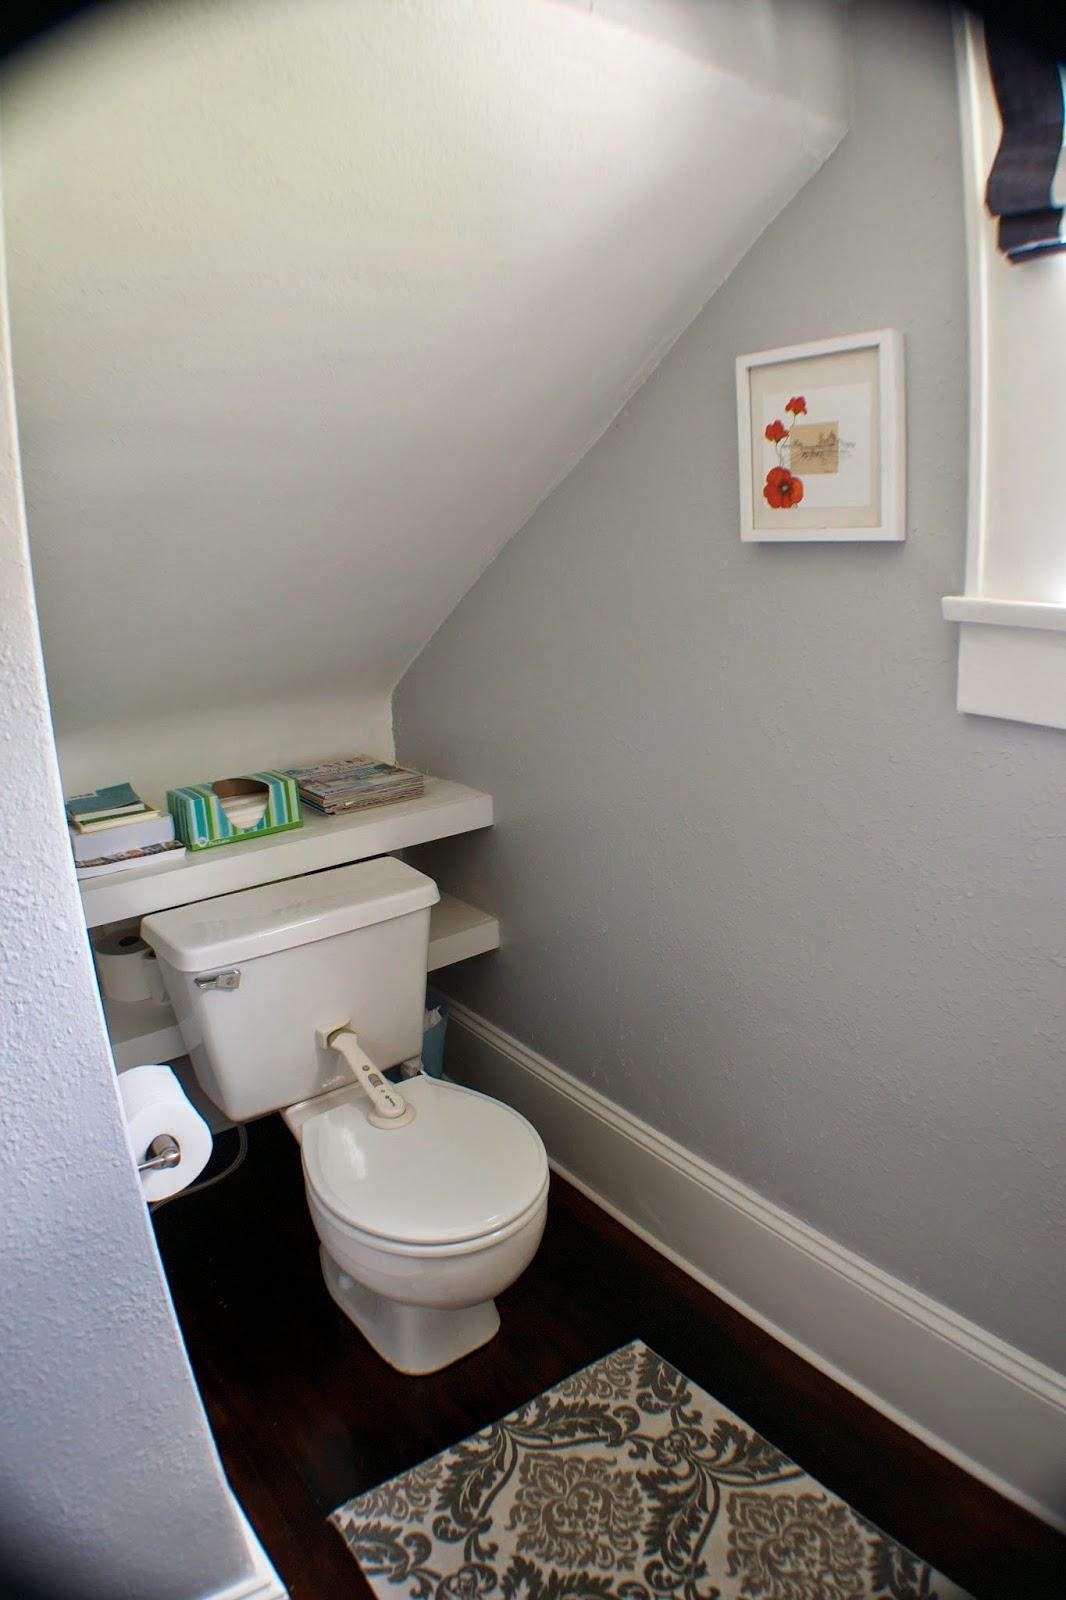 Complete Bathroom Remodel remodelaholic | complete bathroom remodel with marble subway tile